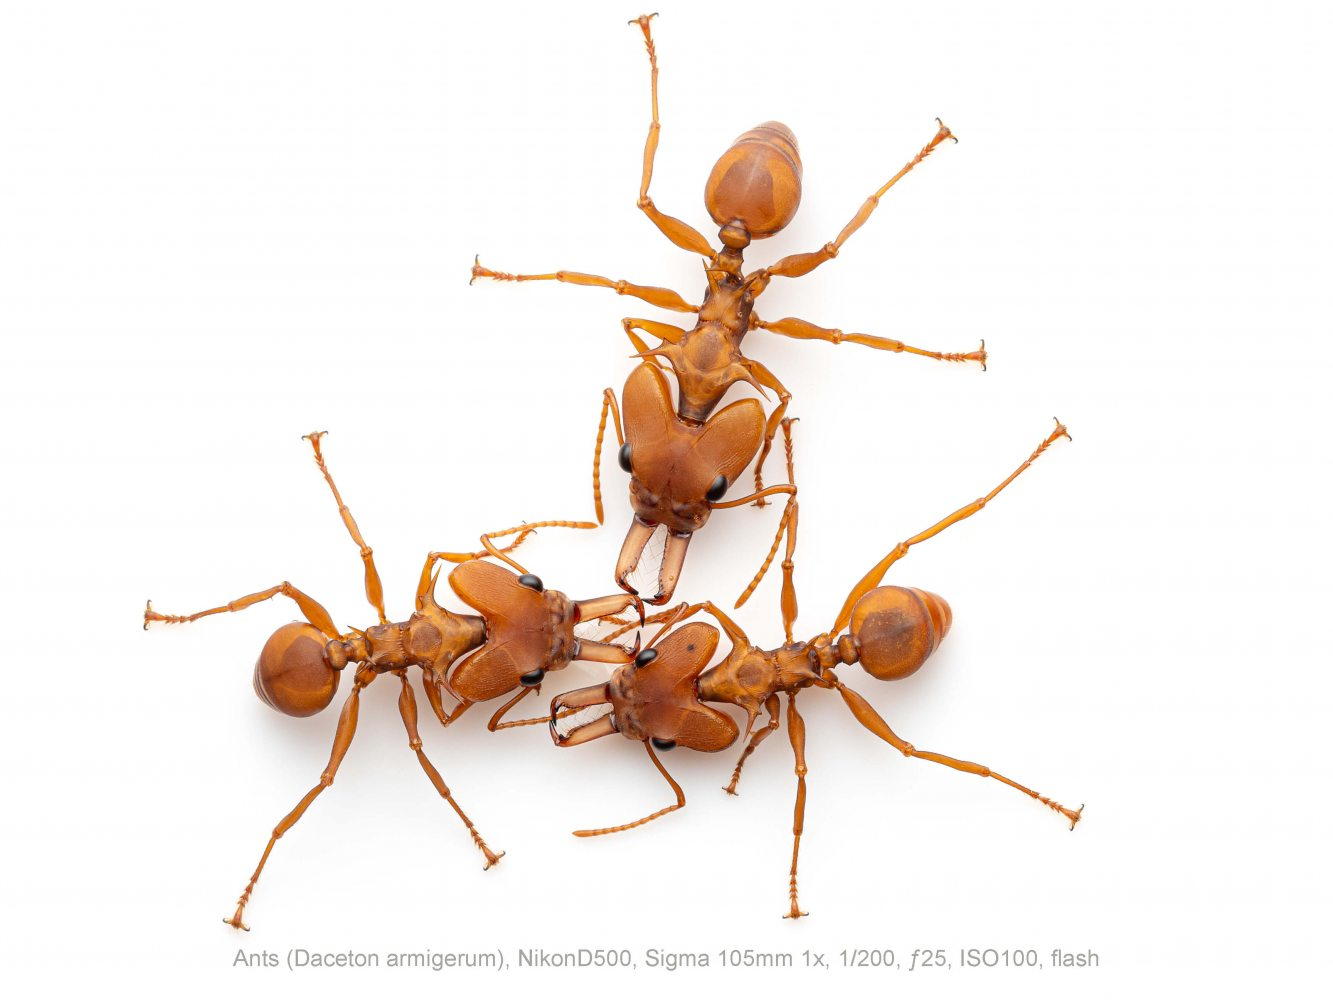 Ants-Daceton-armigerum